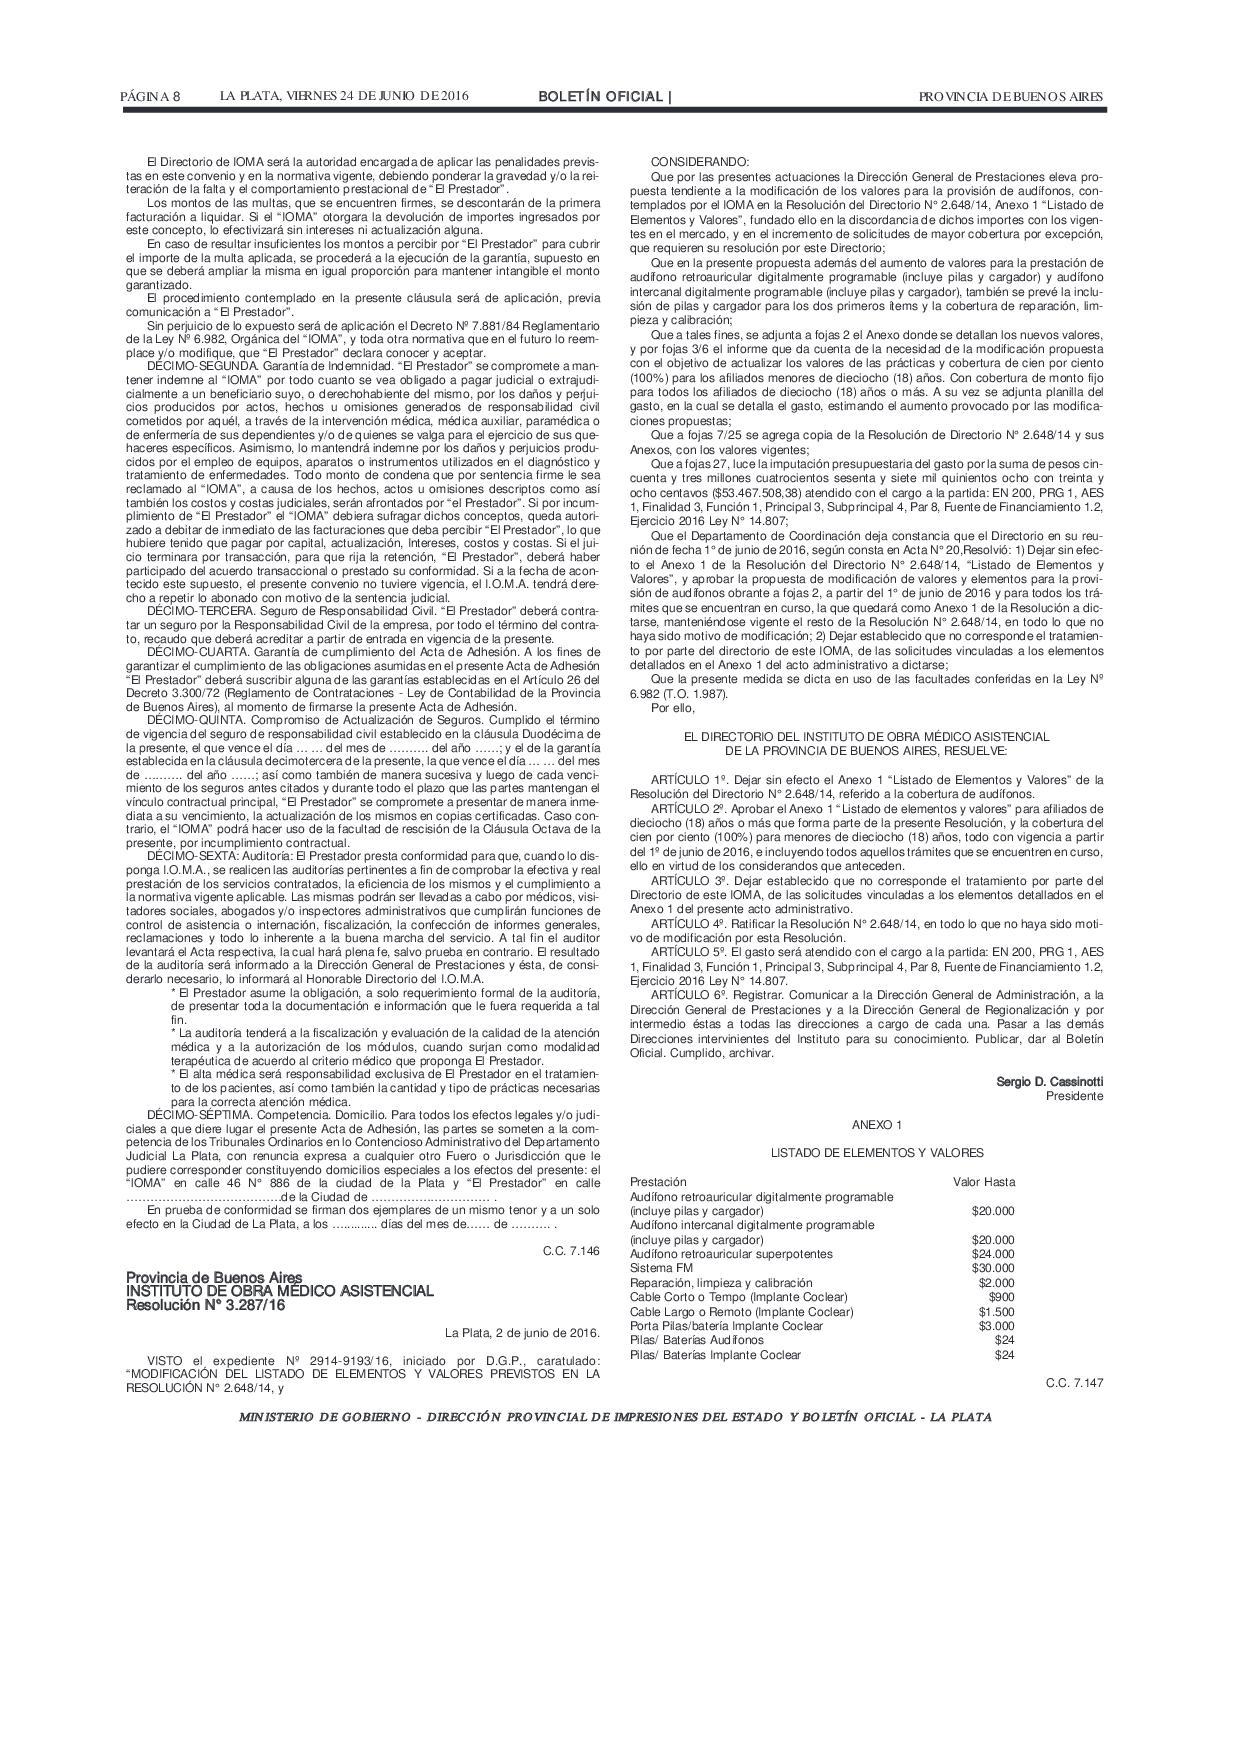 Ioma resolucin nro 328716 modifica listado y valores audfonos ioma 8suple 1 mayo suplemento2016 06 241466687811 thecheapjerseys Gallery